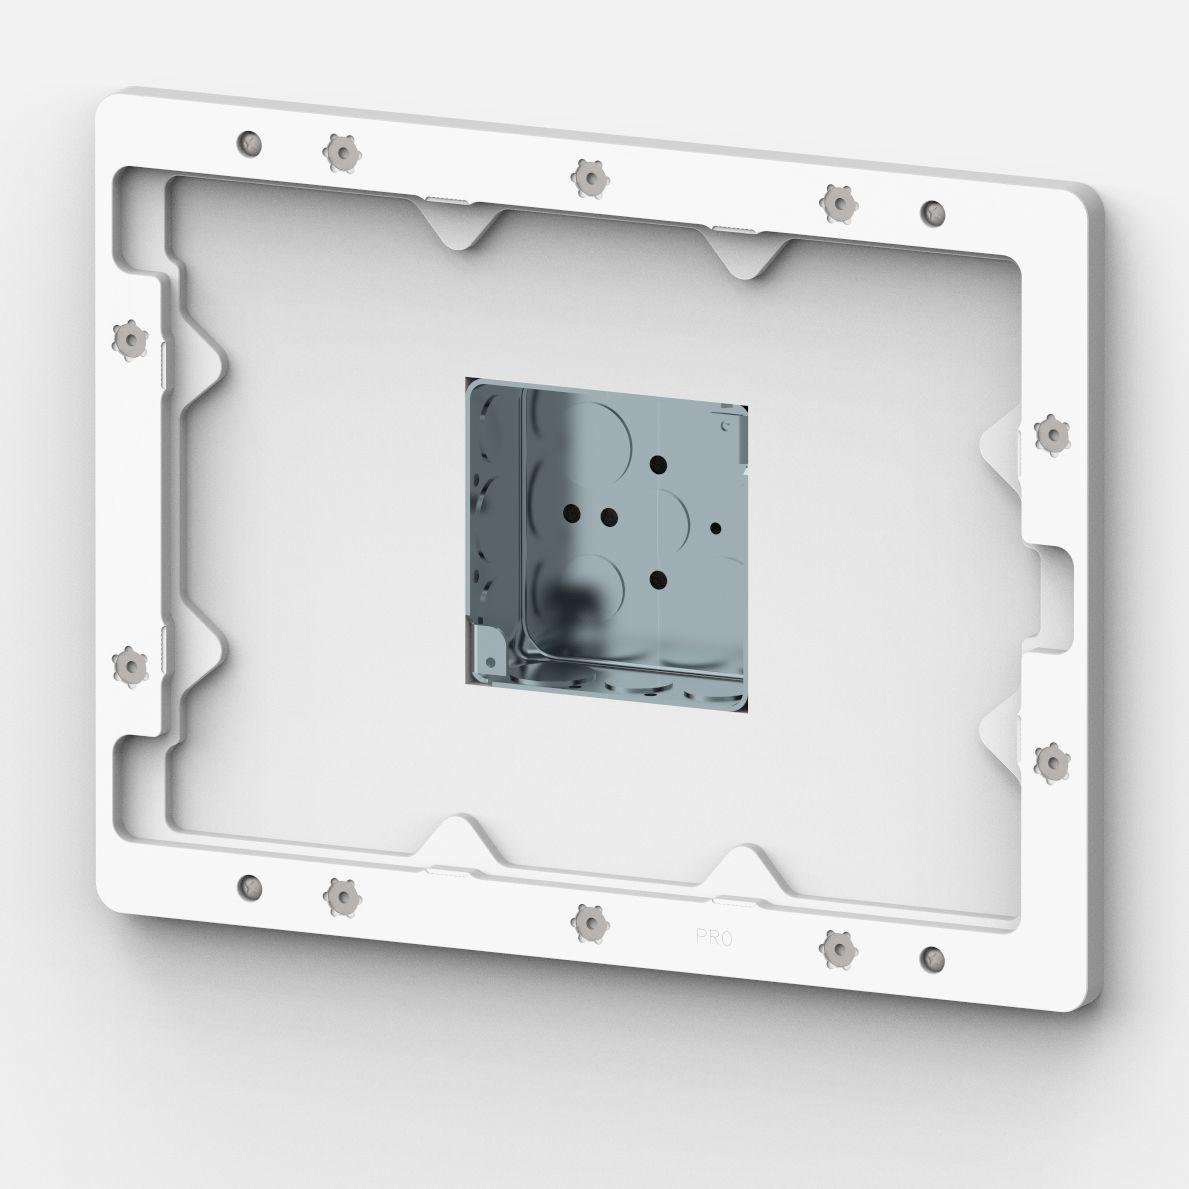 VidaMount On-Wall iPad Tablet Enclosure / Mount | Pinterest | Hide ...